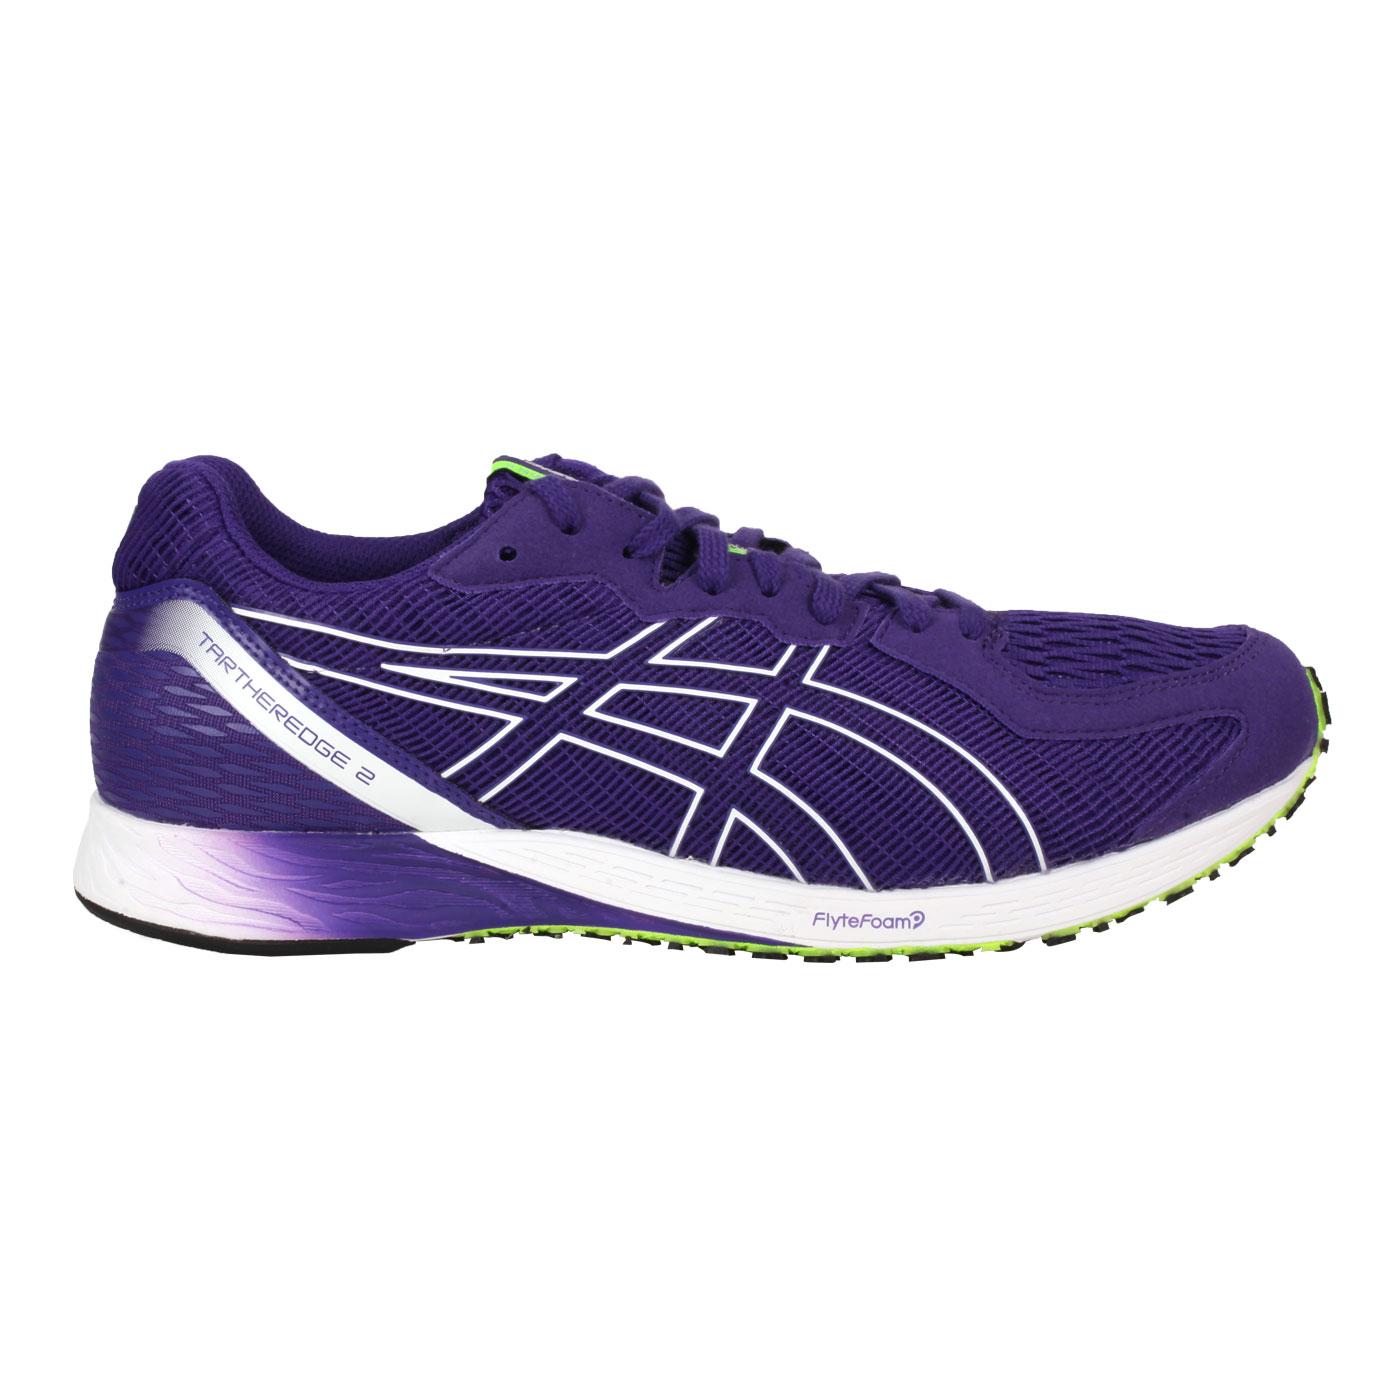 ASICS 男款路跑鞋  @TARTHEREDGE 2@1011A854-501 - 深紫螢光綠